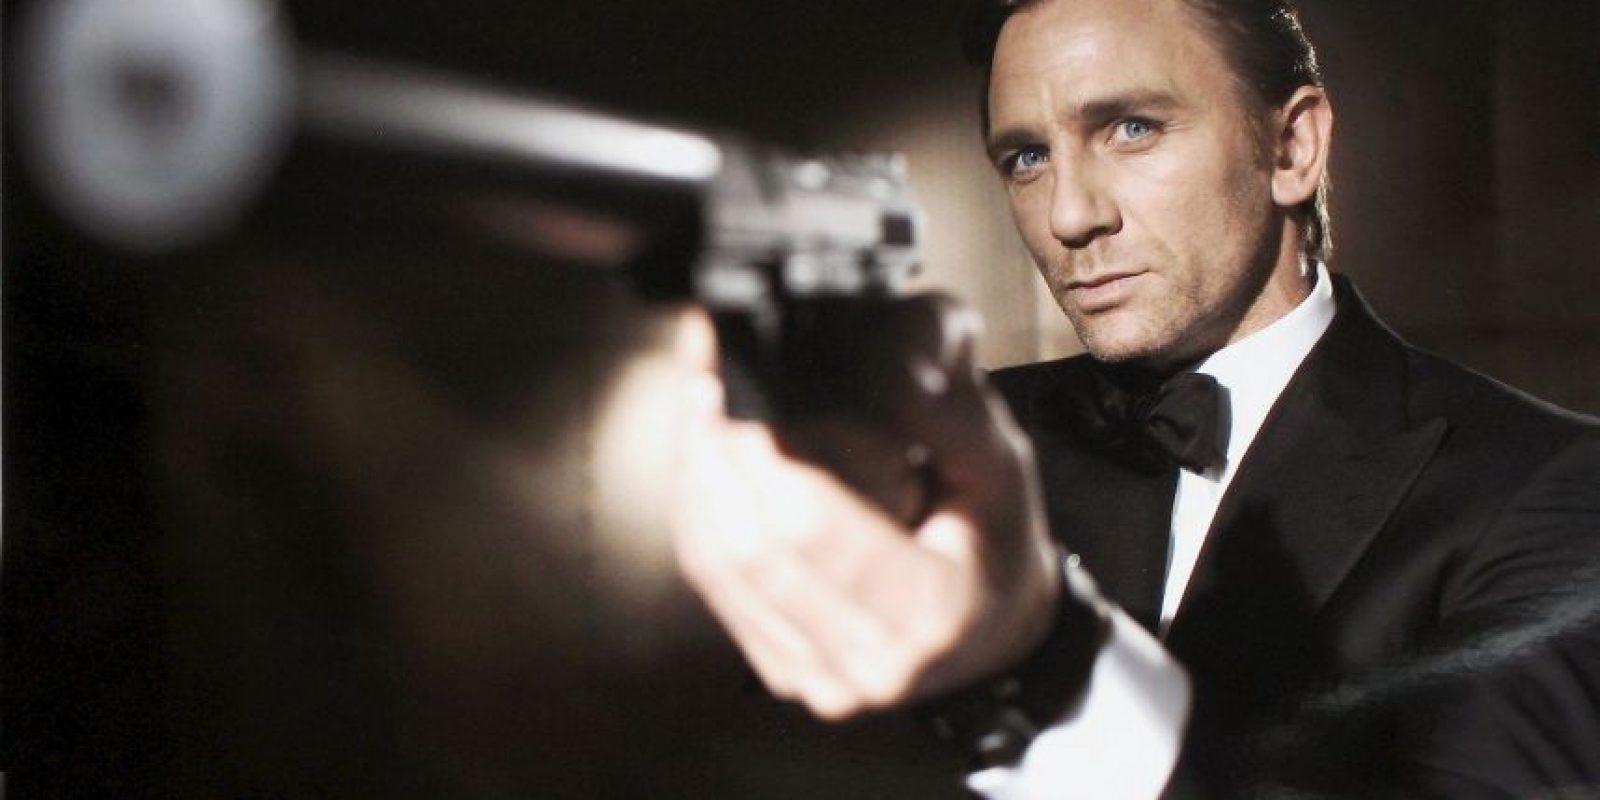 Daniel Craig encarnando a James Bond Foto:Getty Images